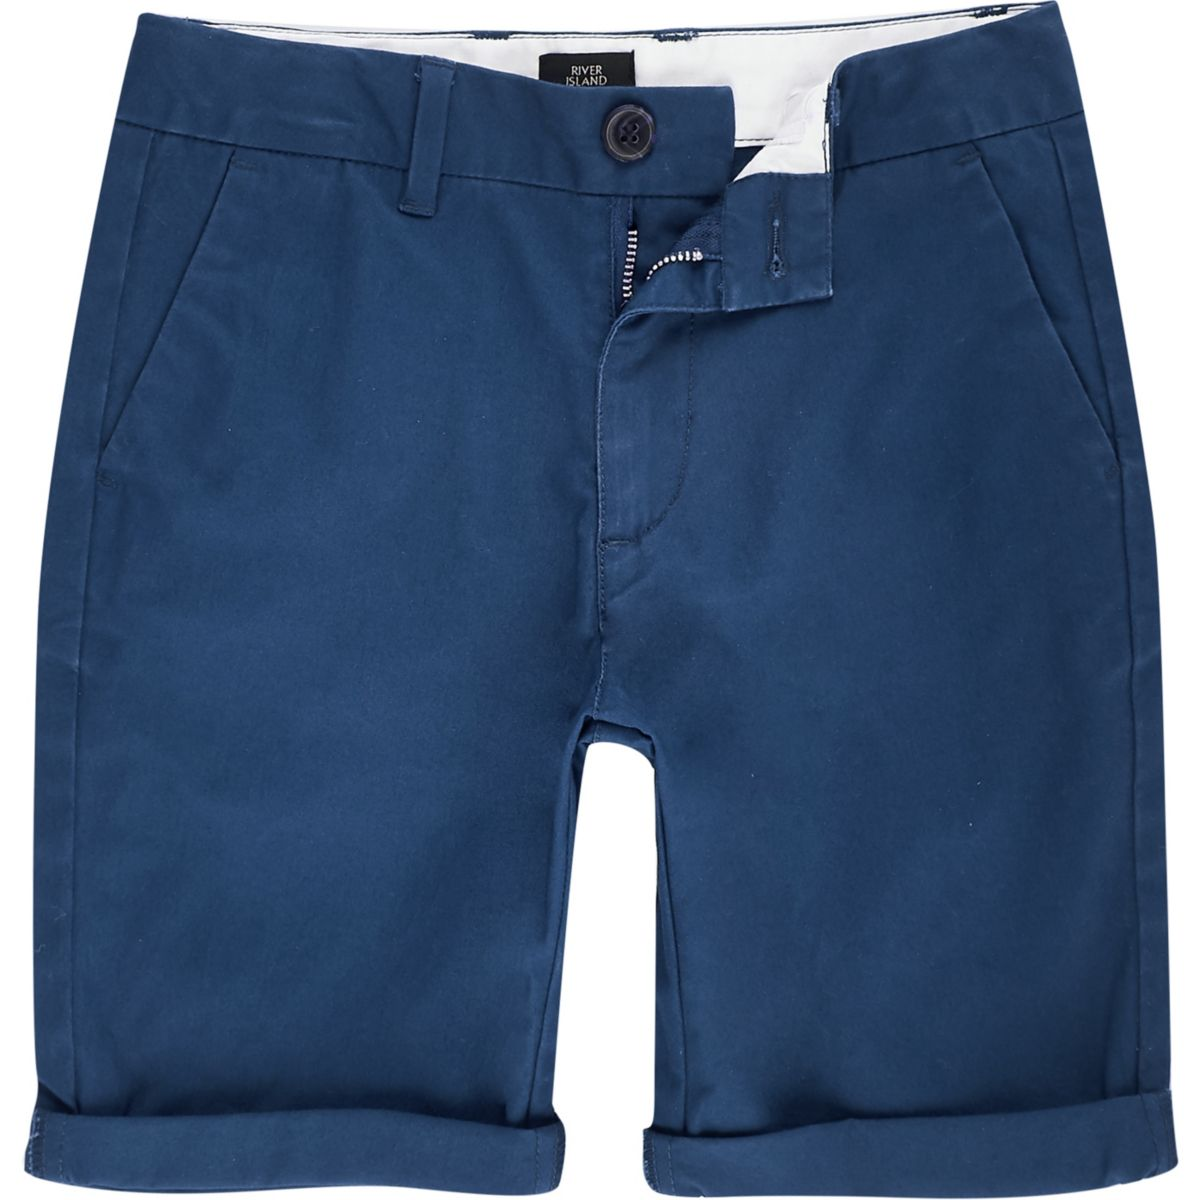 Boys blue Dylan chino shorts